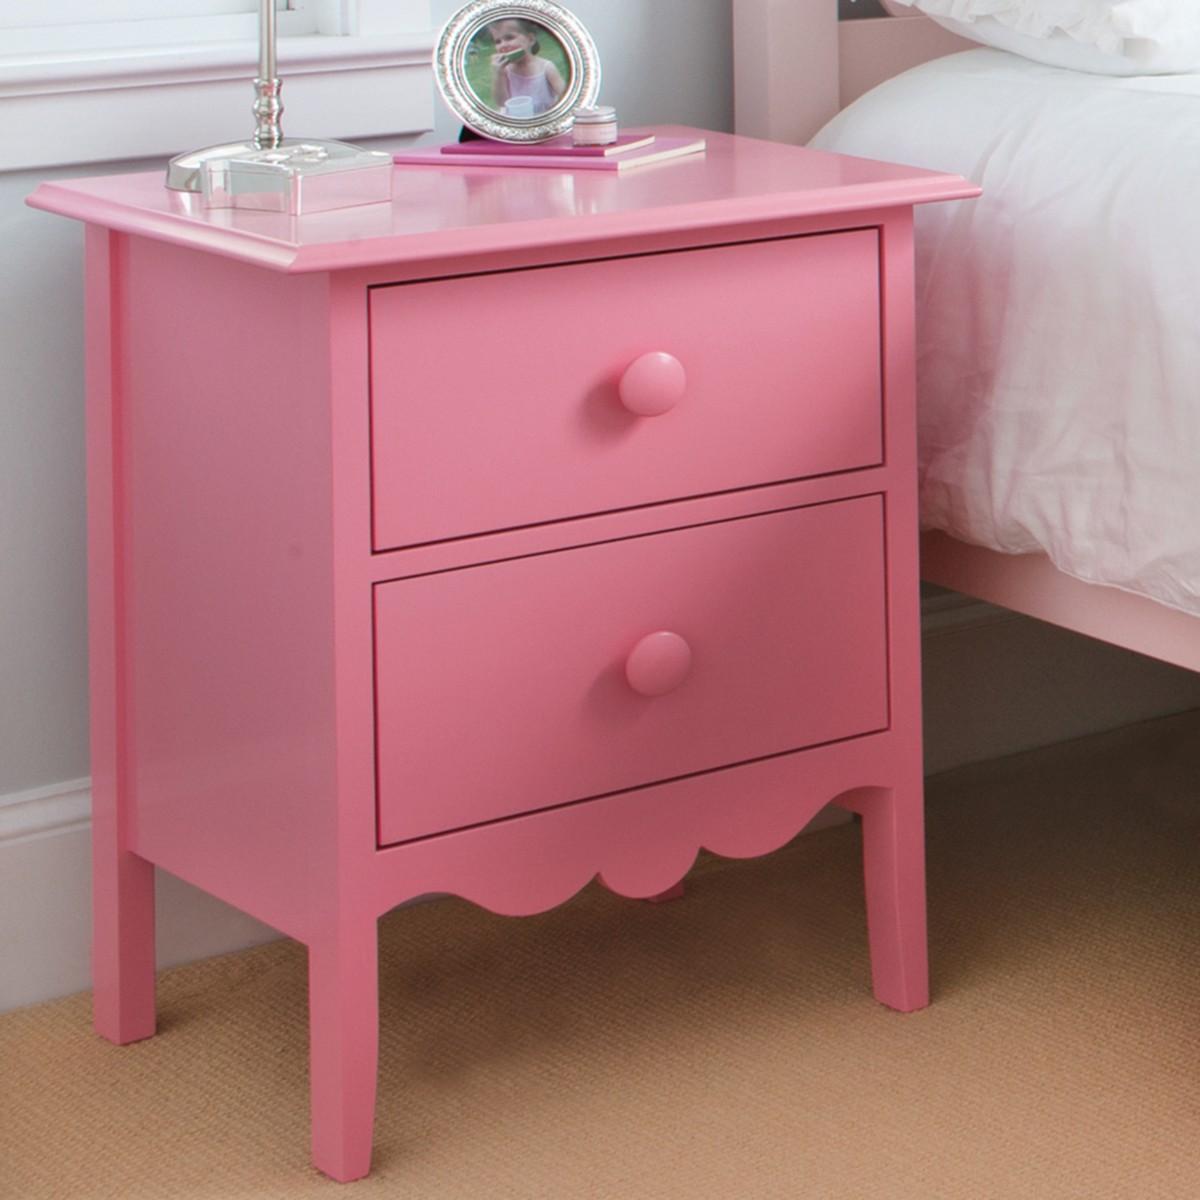 Nellie 2 Drawer Bedside Table